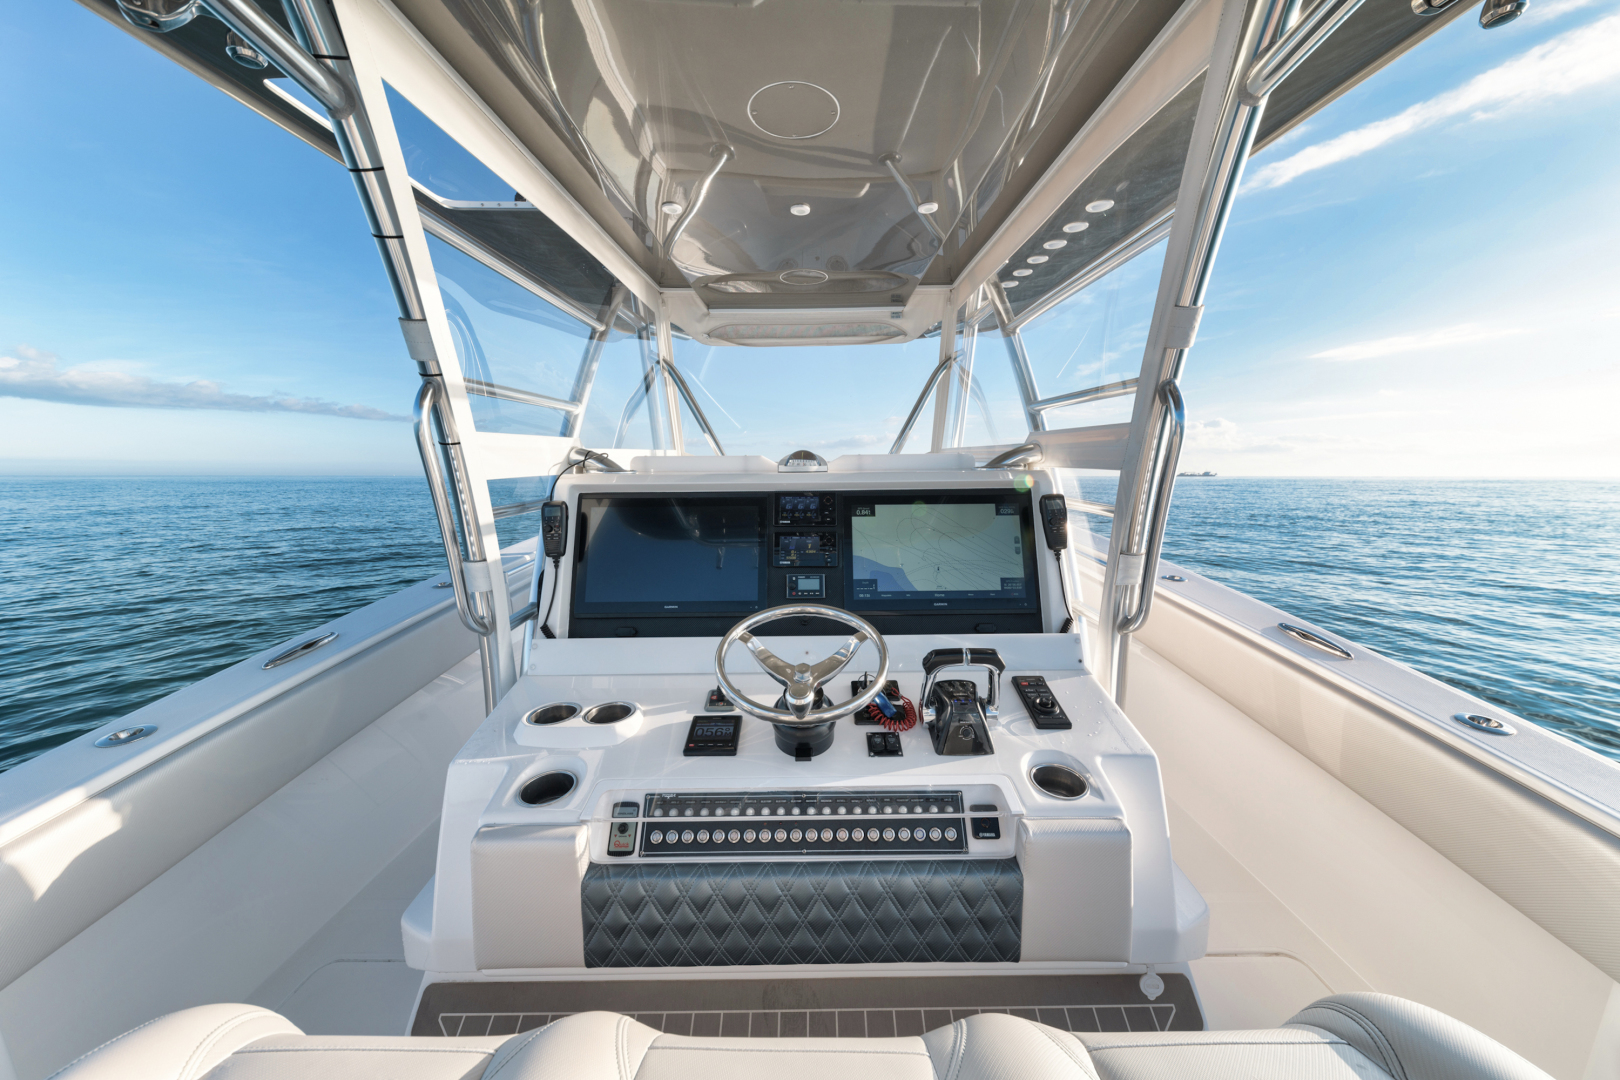 Invincible-Open Fisherman 2017-42 Invincible Jupiter-Florida-United States-1604184   Thumbnail